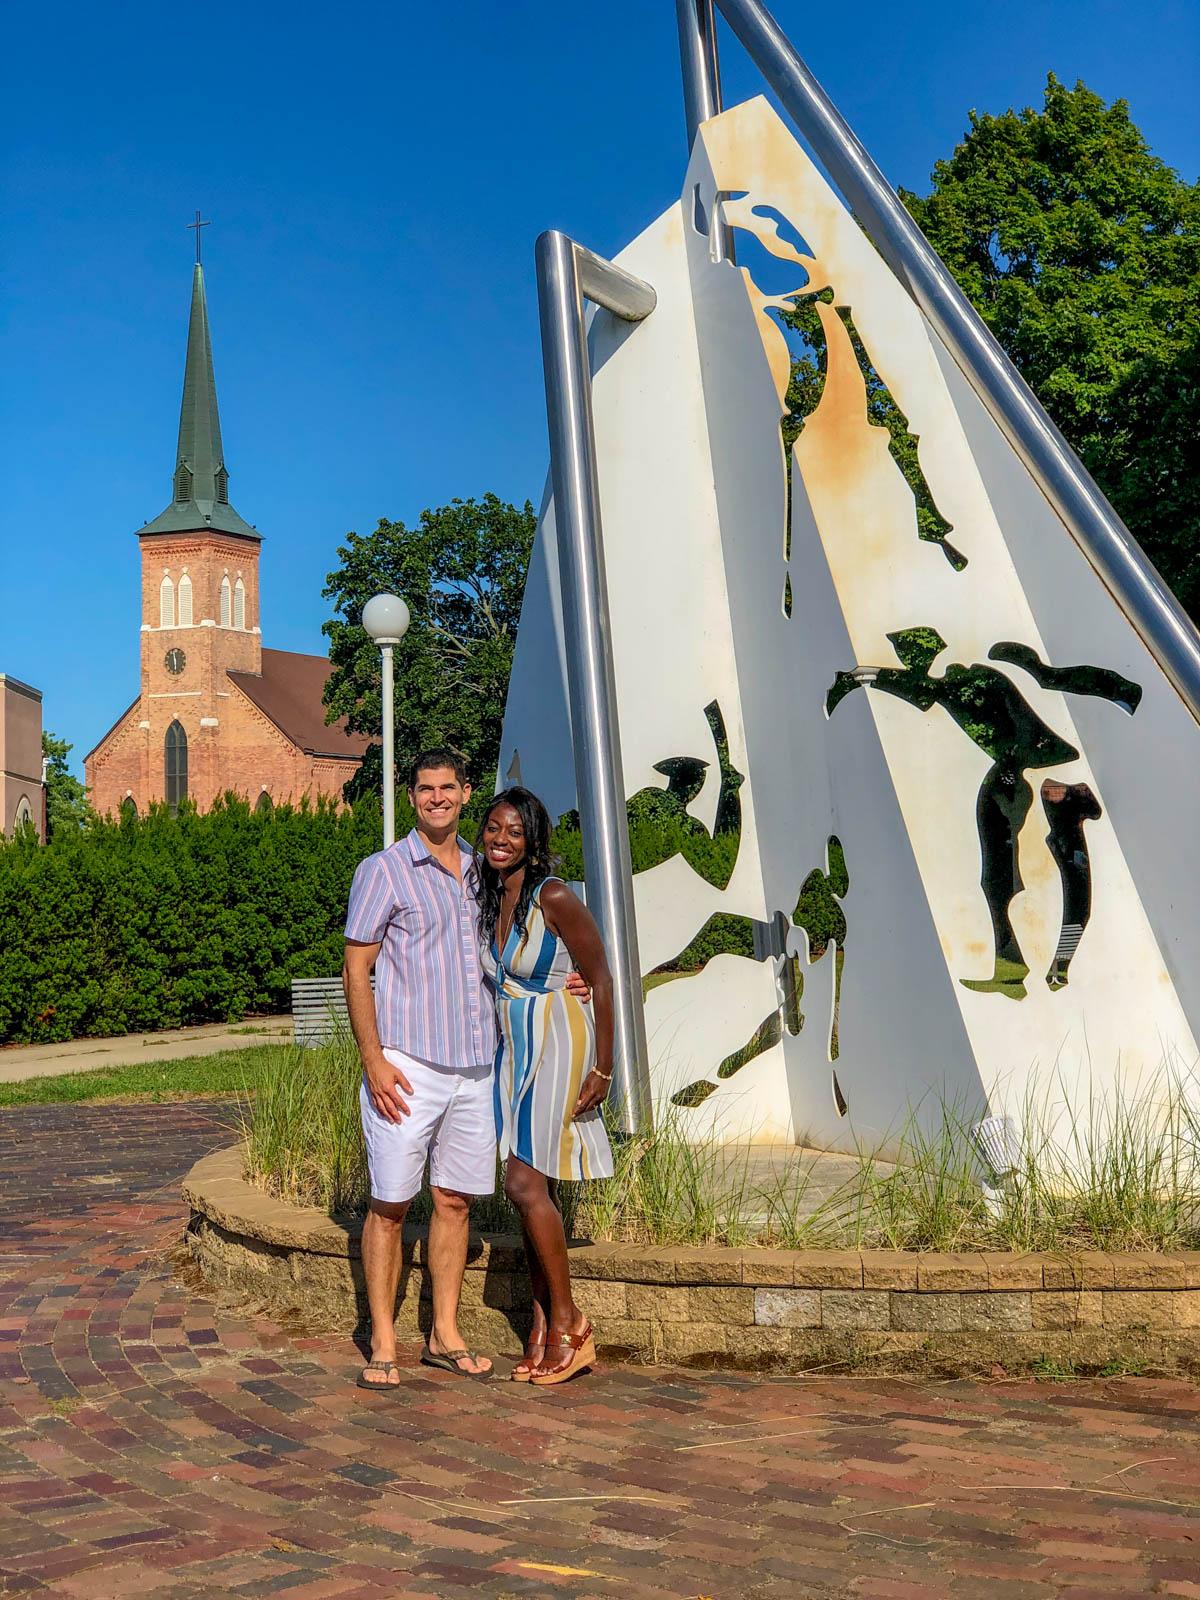 St. Joseph Michigan Family Vacation